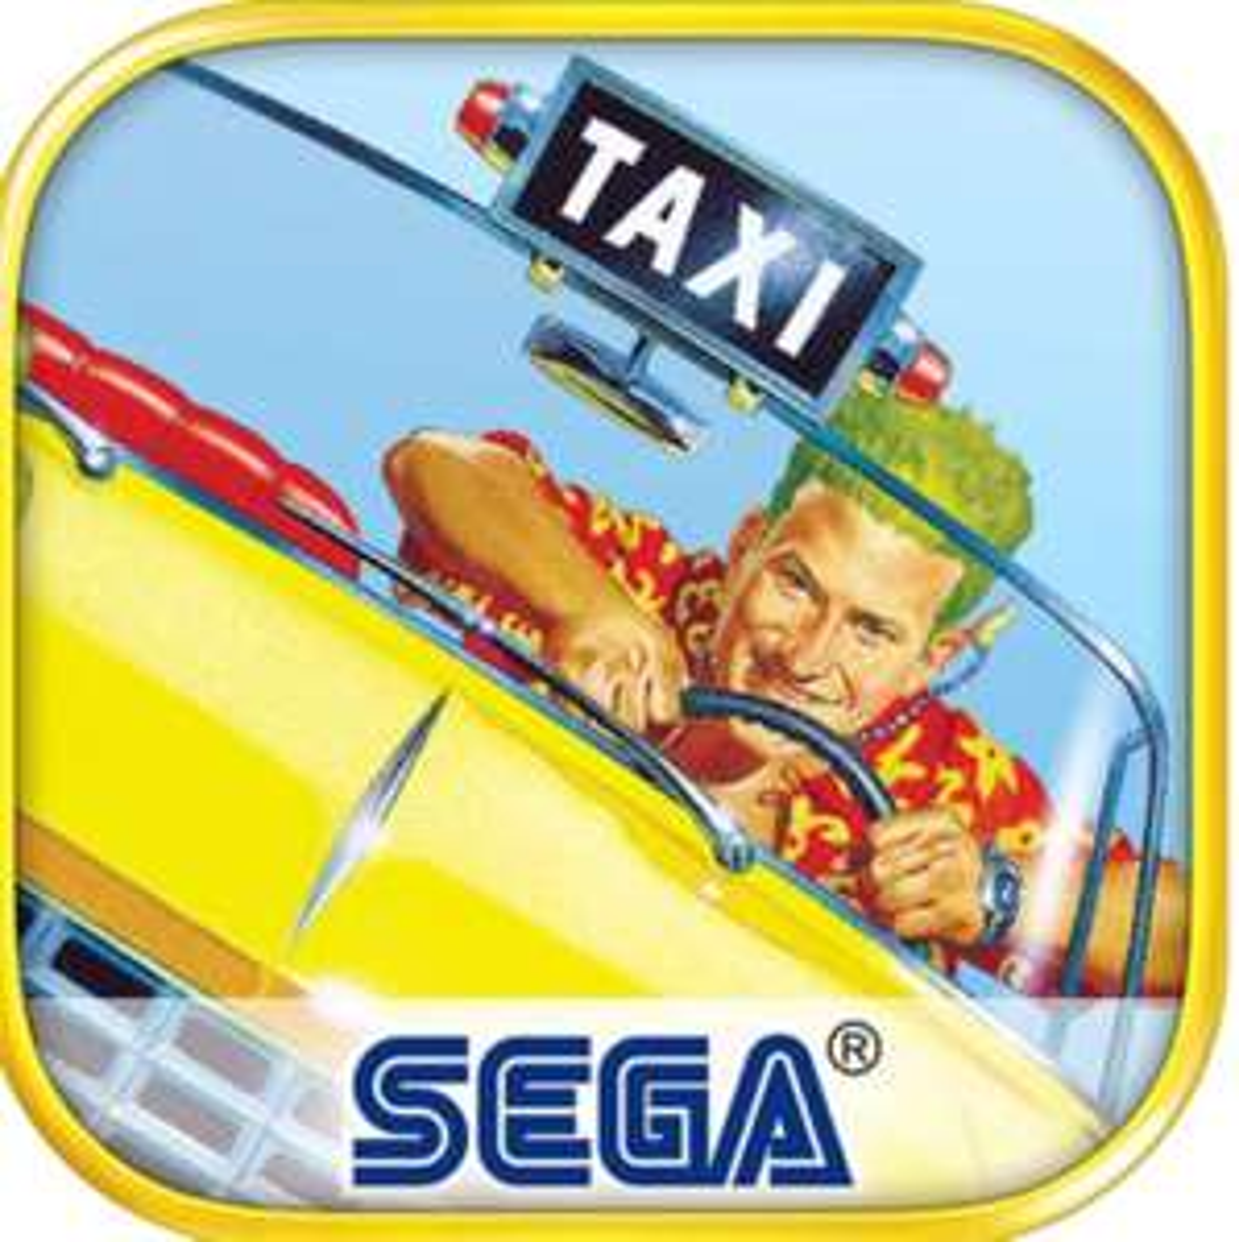 [iOS] SEGA Klassiker Crazy Taxi kostenlos statt 5,49€